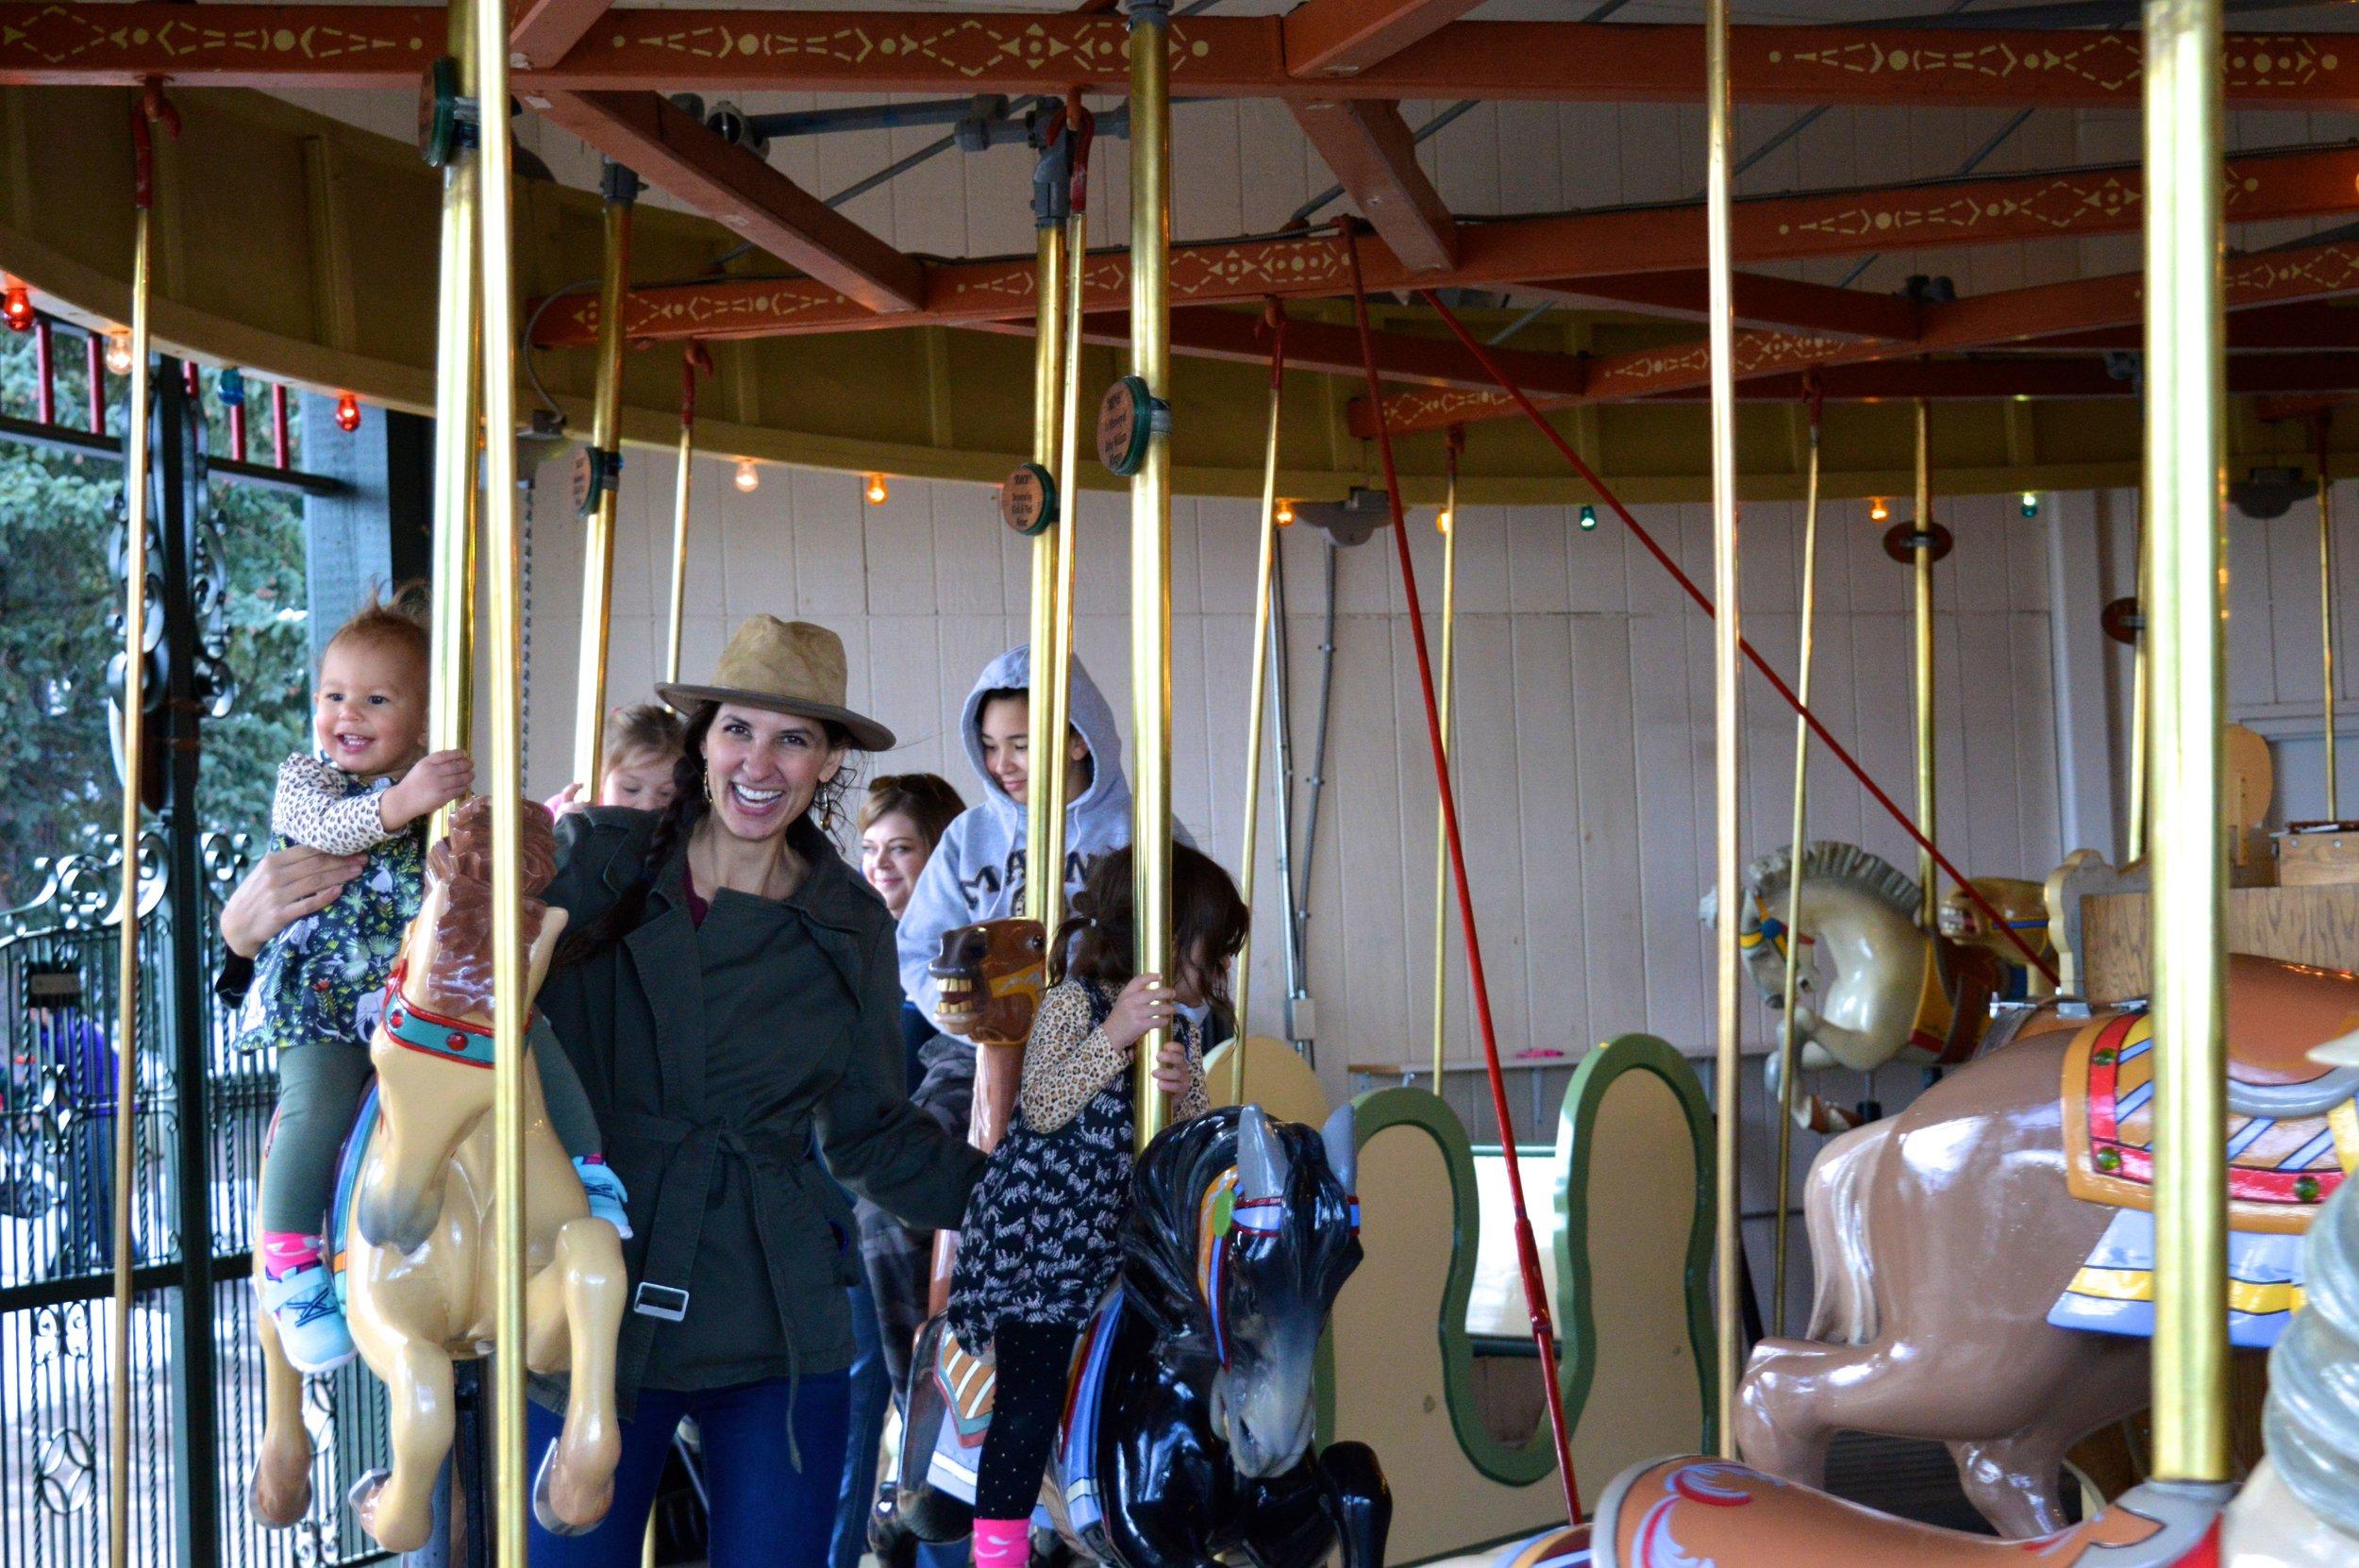 cheyenne-mountain-zoo-carousel.jpg